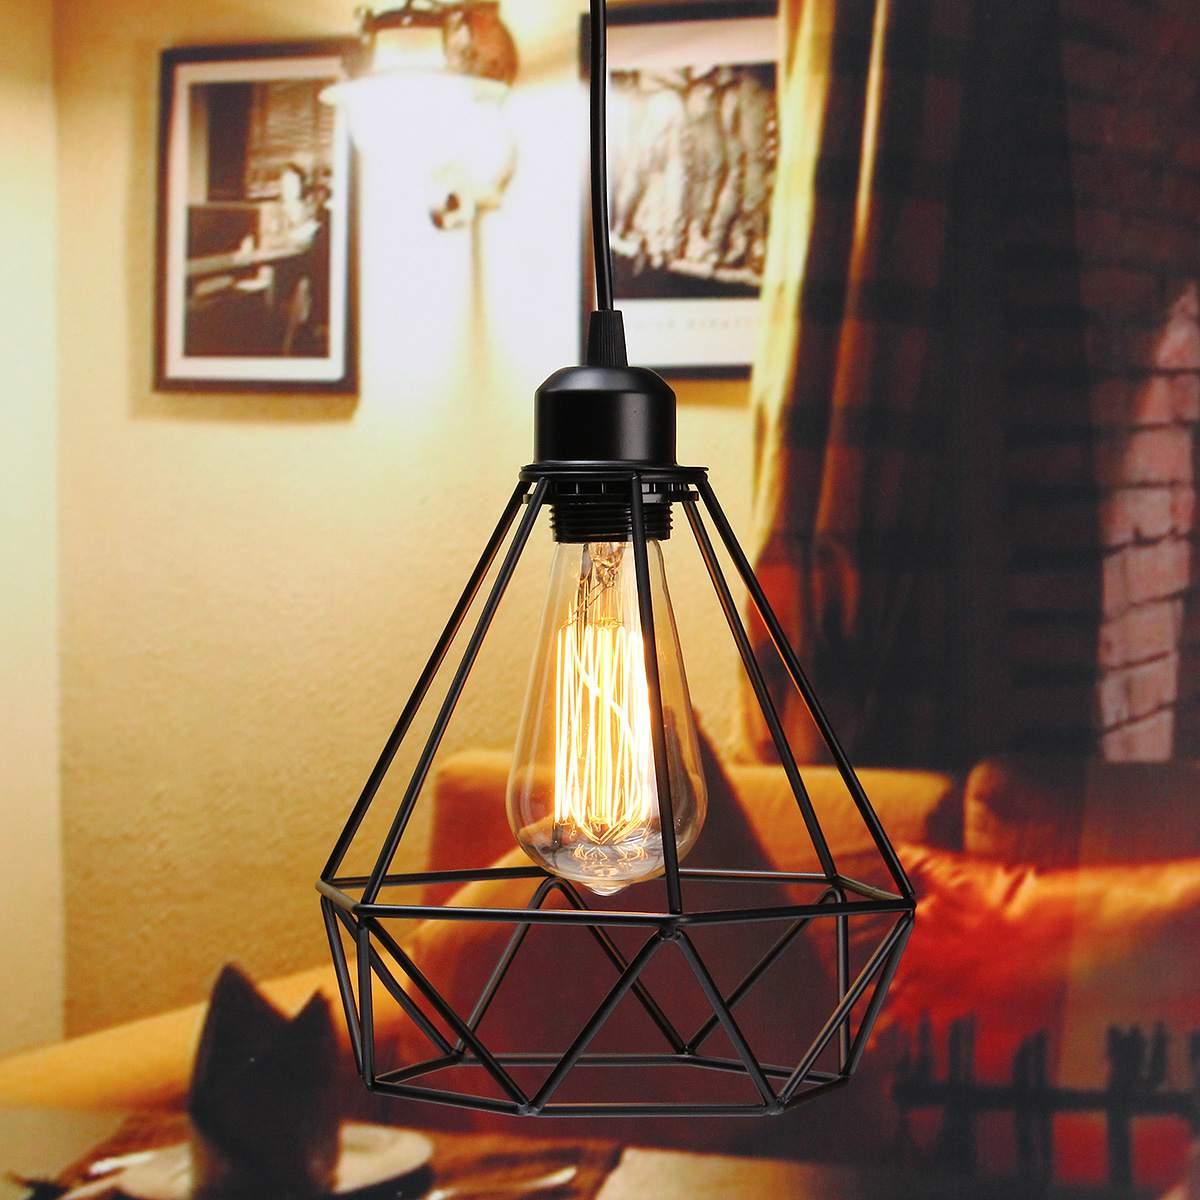 Hot Sale Retro Cage Pendant Light Iron Minimalist Retro Scandinavian Loft Pyramid Pendant Lamp Metal Hanging Lamp E27 Indoor